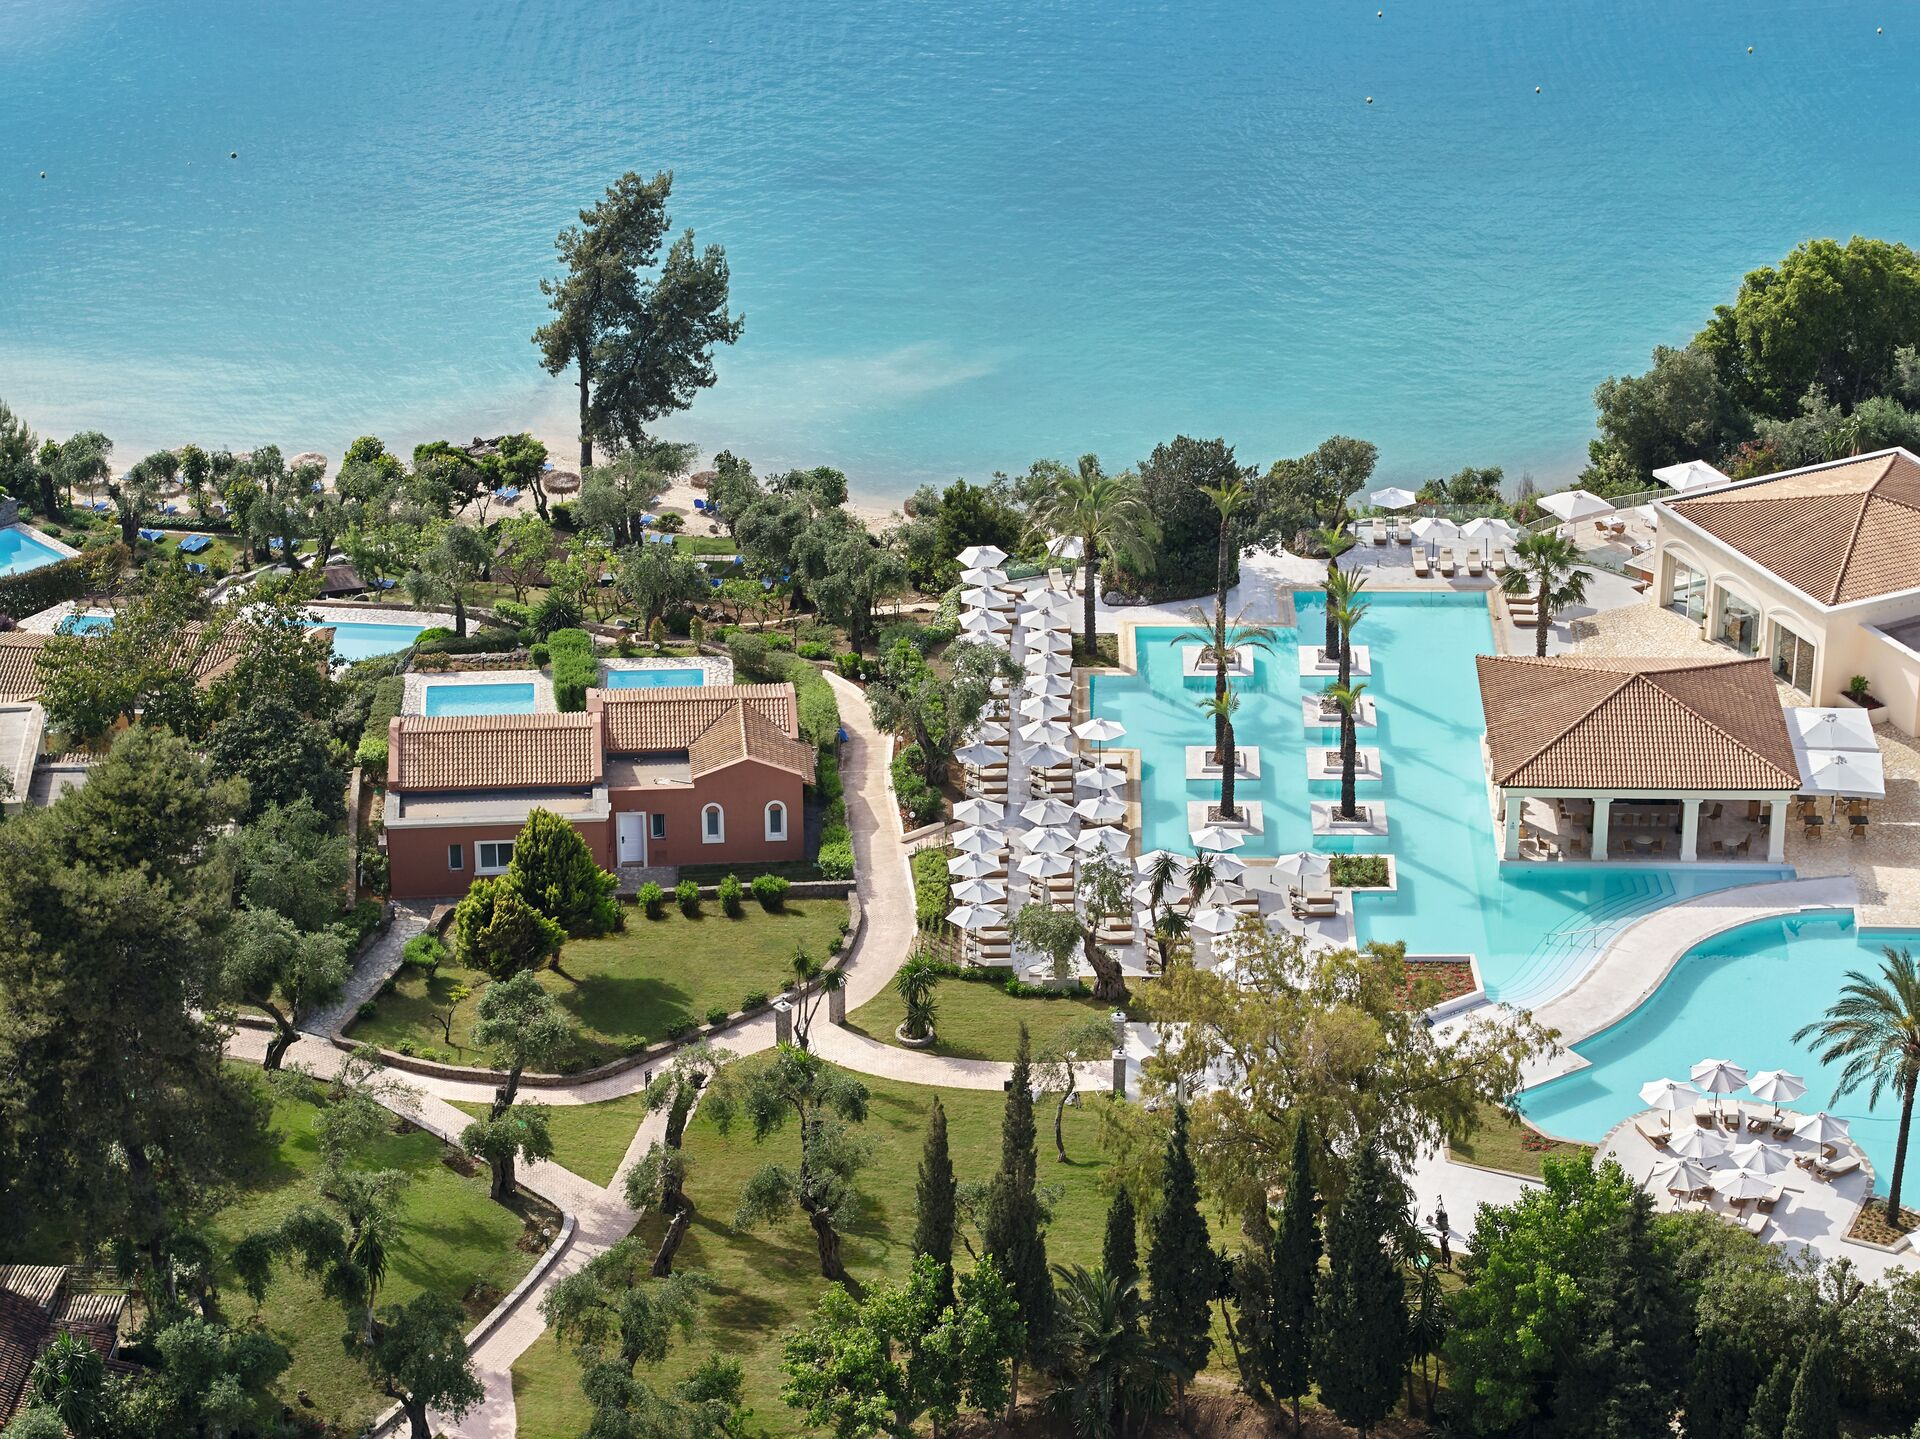 https://cms.satur.sk/data/imgs/tour_image/orig/01-eva-palace-luxury-hotel-in-corfu_72dpi-1946643.jpg